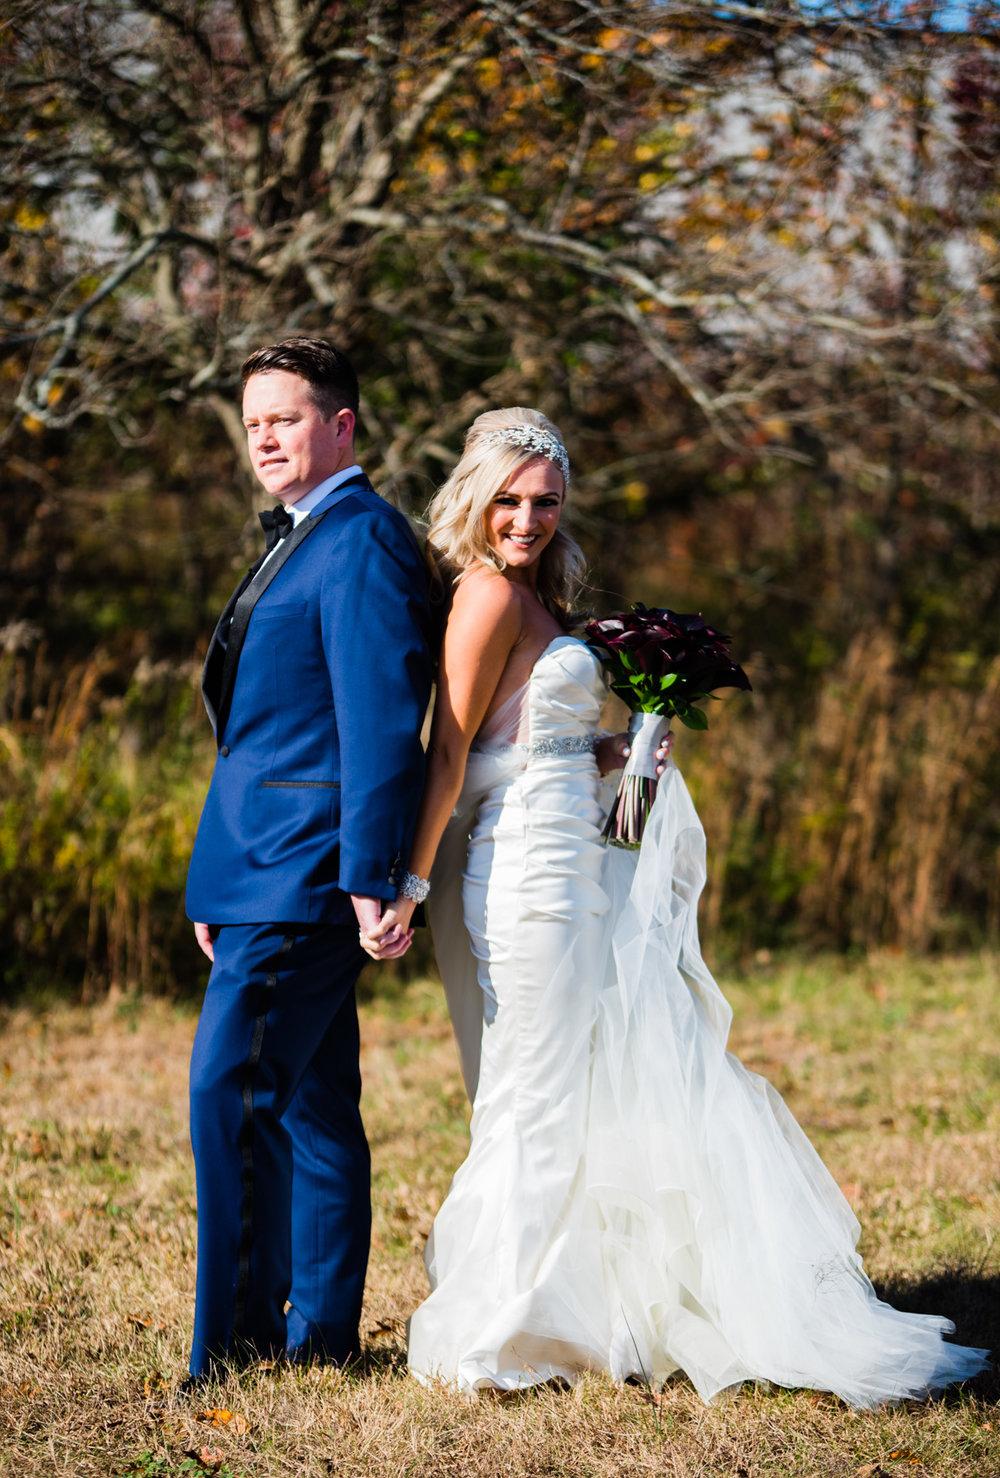 Luceins Manor Wedding Photos - 026.jpg